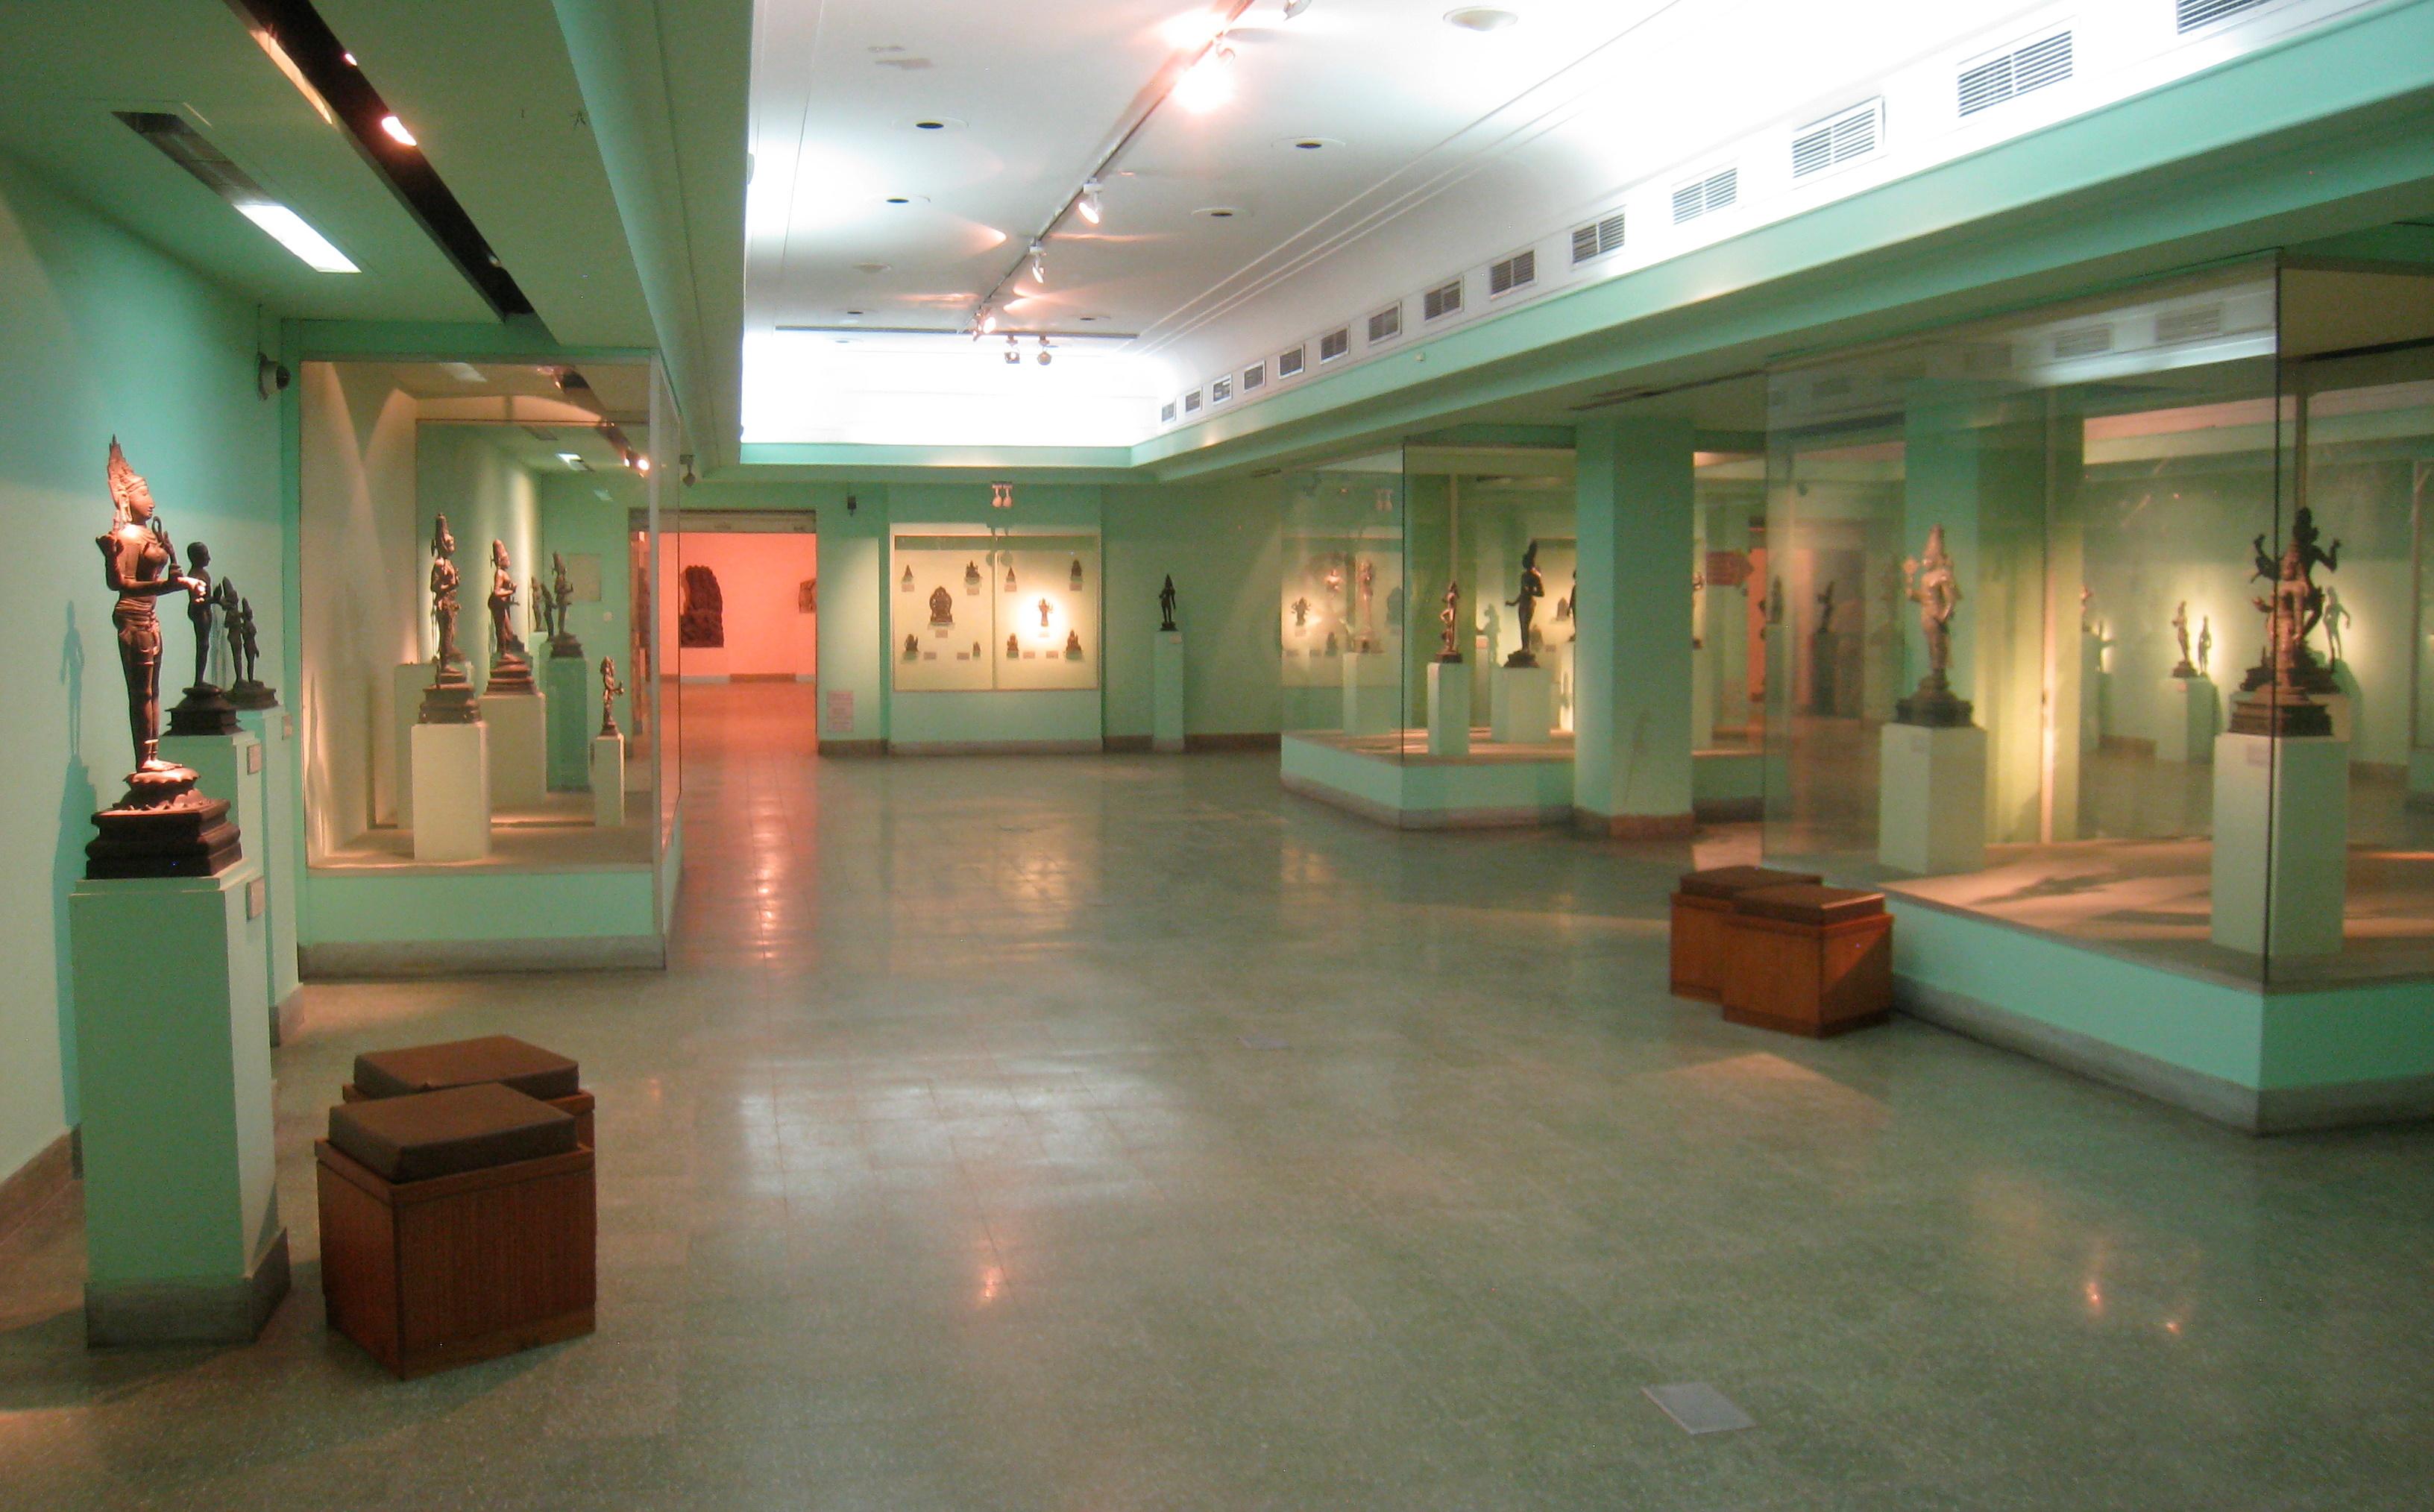 File:Interior view - National Museum, New Delhi - IMG 2206 ...